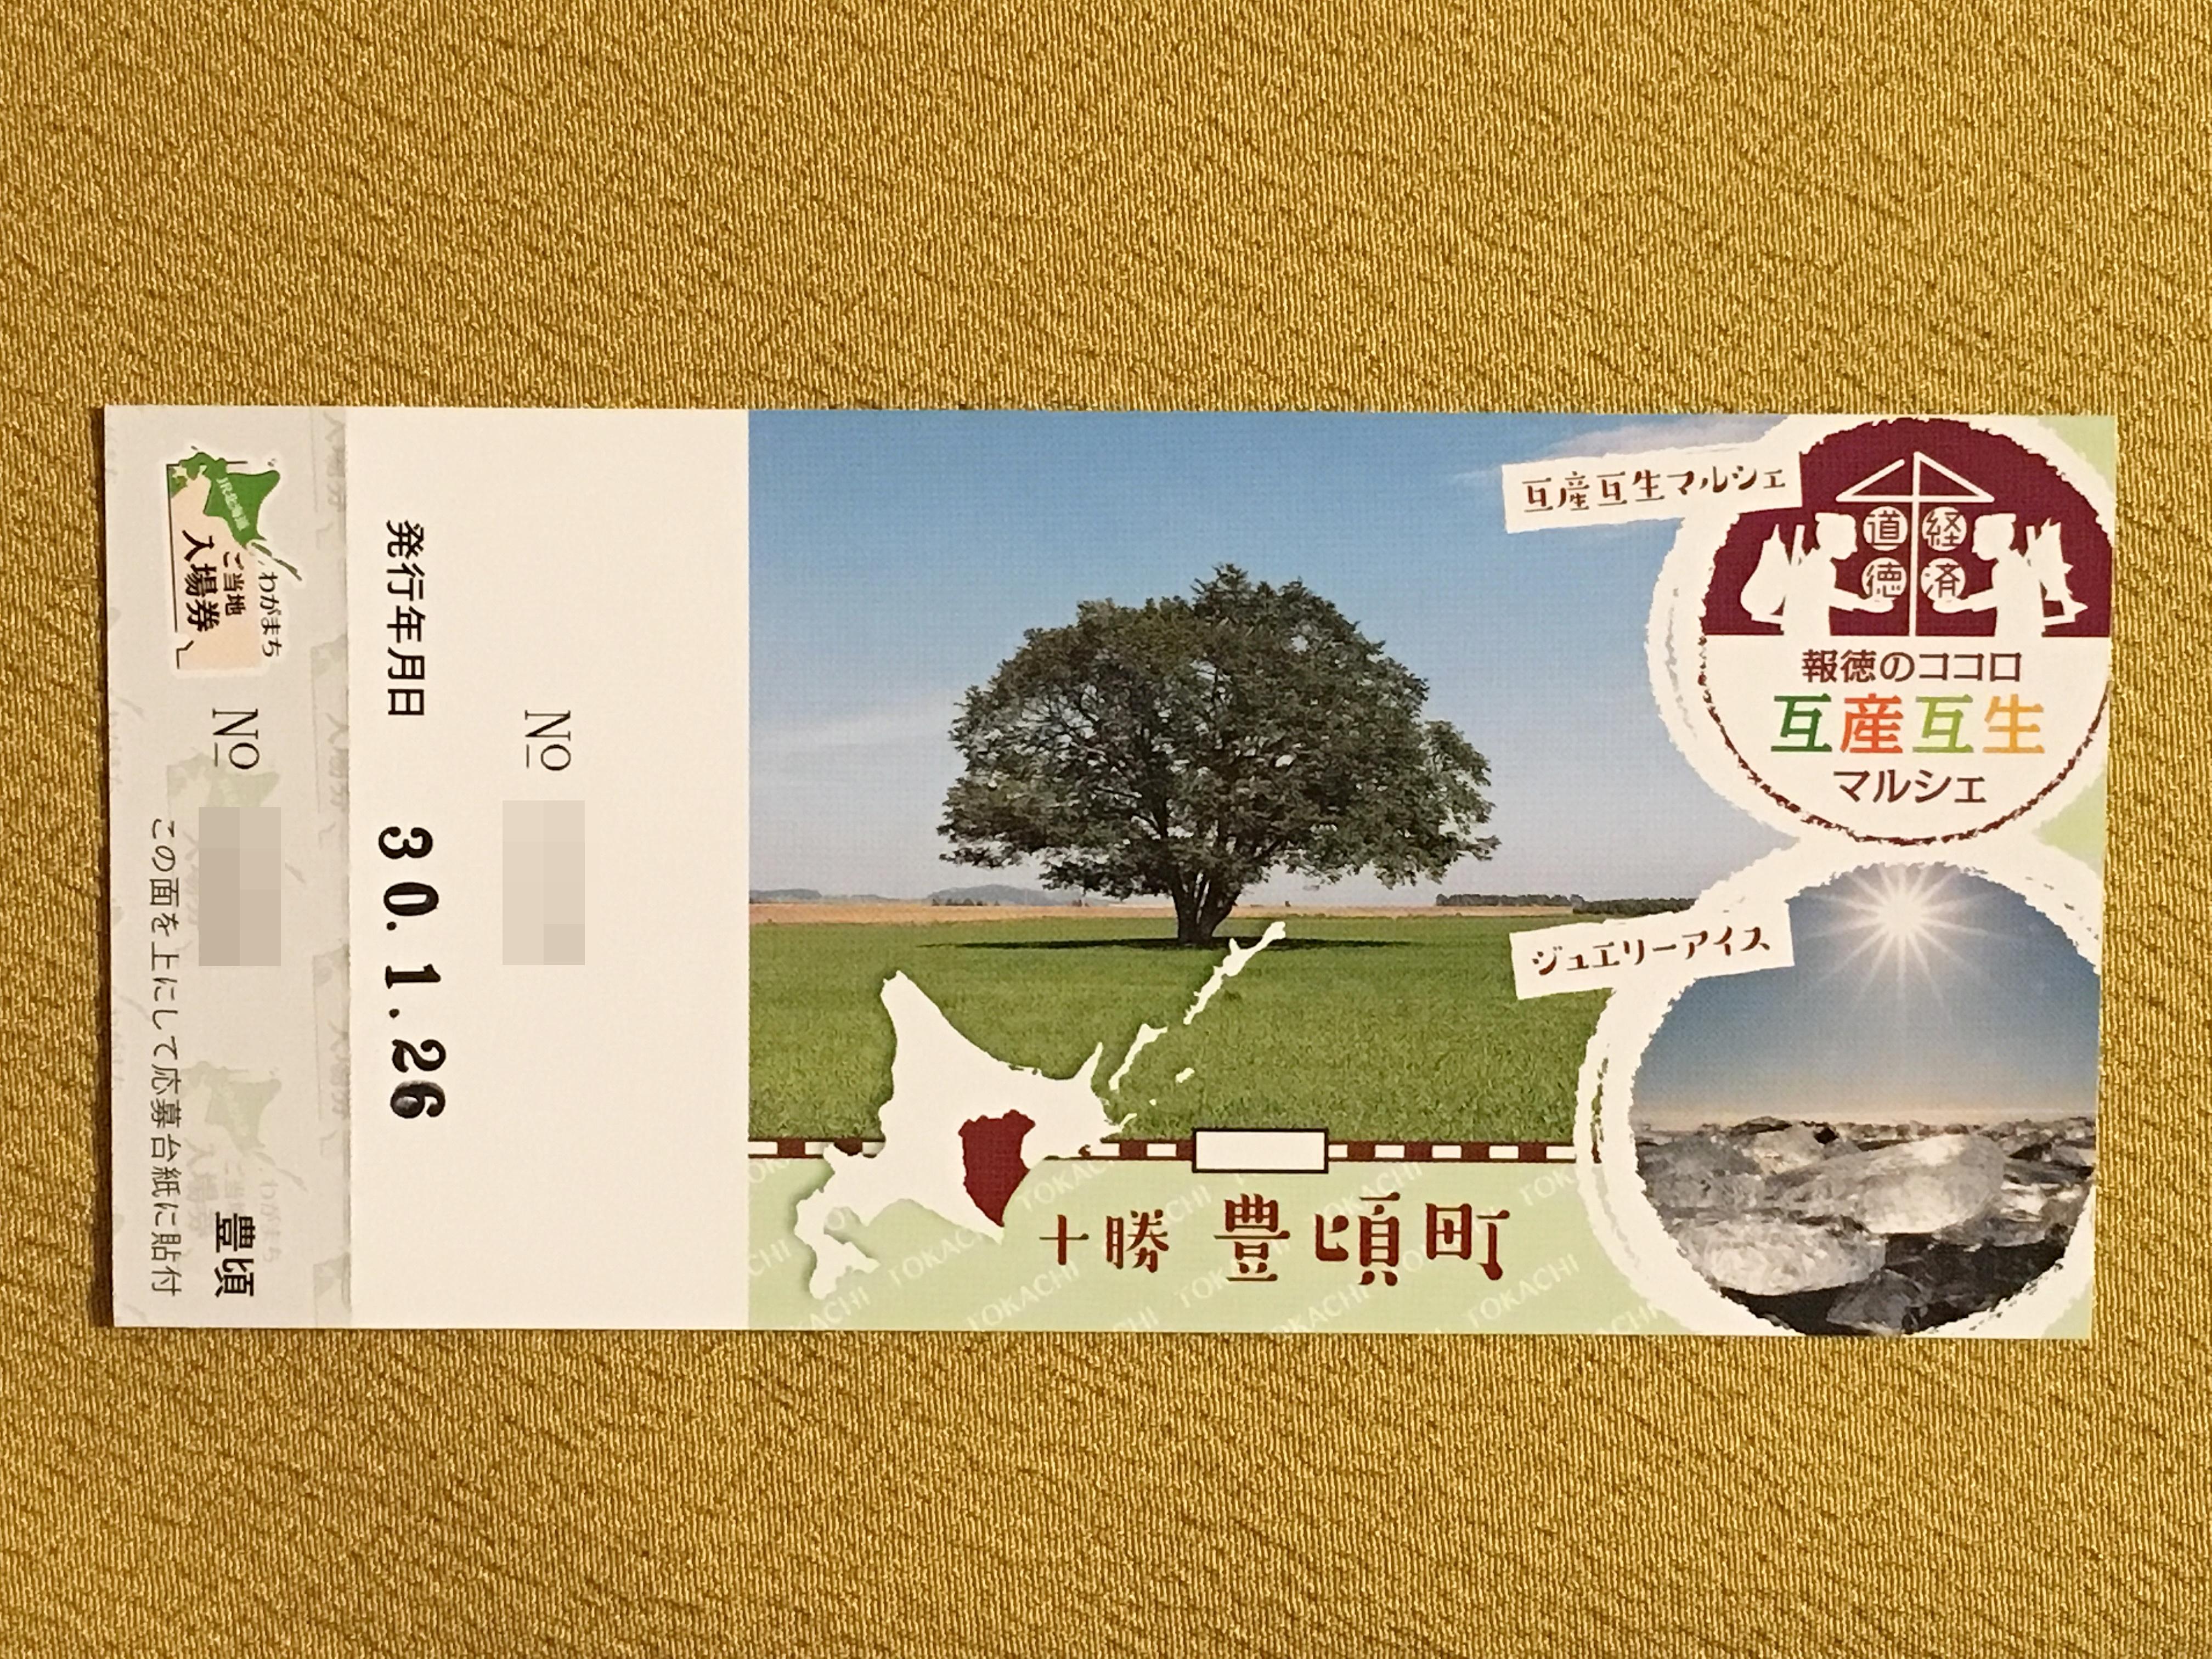 JR北海道ご当地入場券 豊頃駅裏.JPG